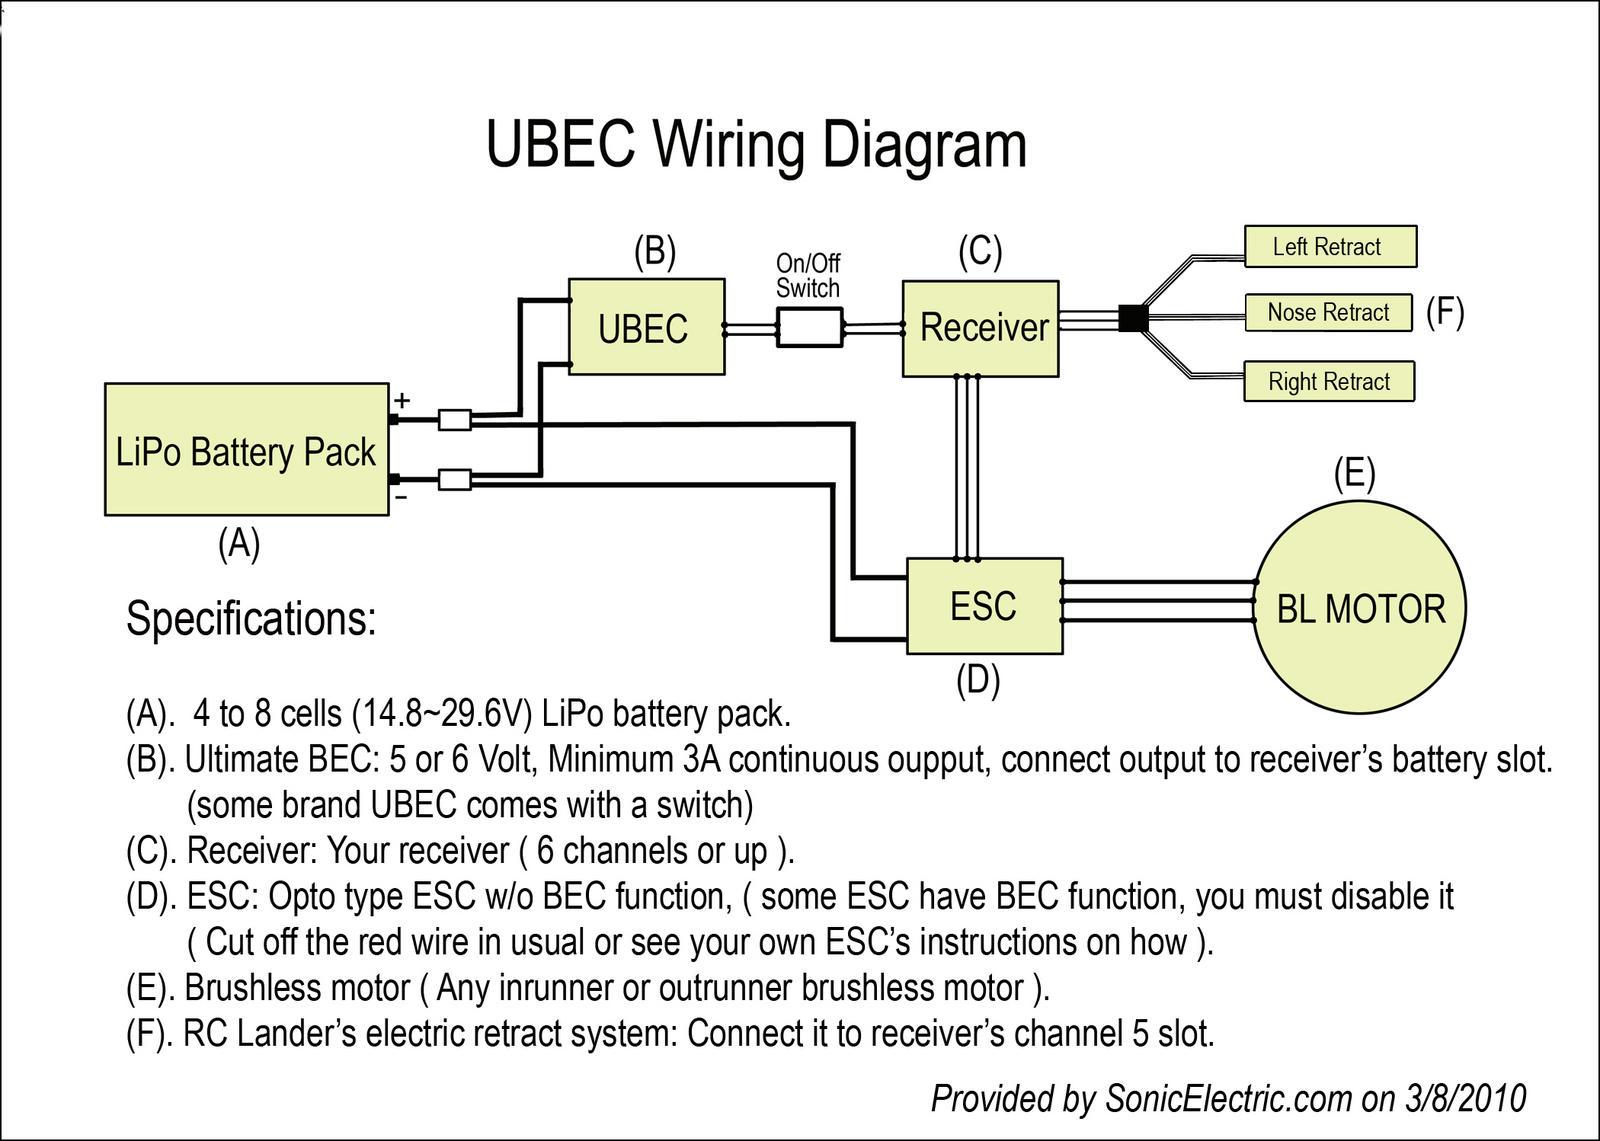 Attachment Browser  Ubec 20wiring 20diagram-rs Jpg By Davebc